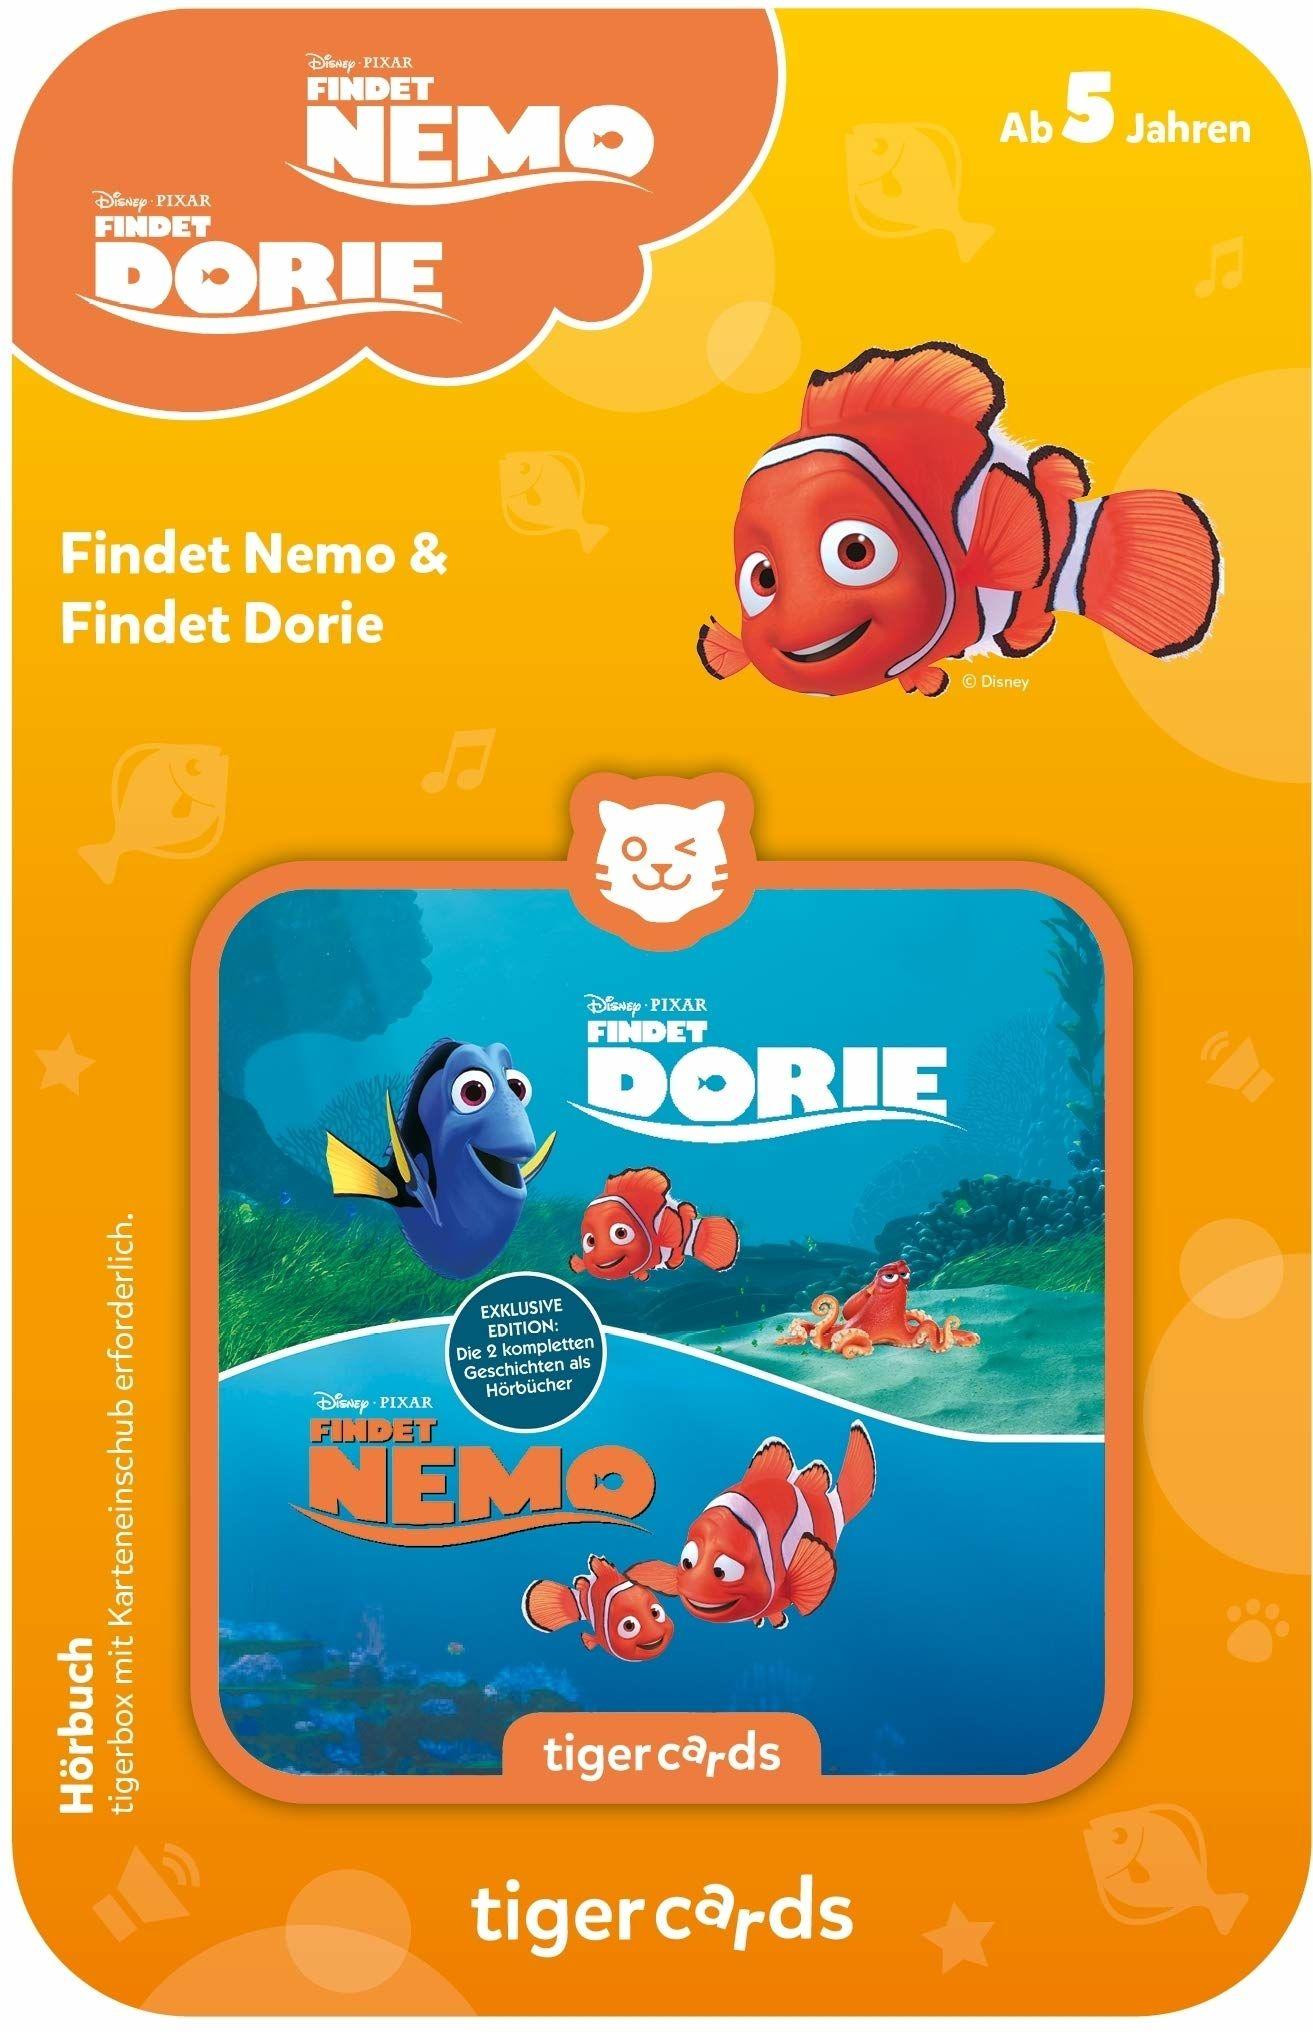 Tigerbox 4181 tigercard Nemo/Findet Dorie